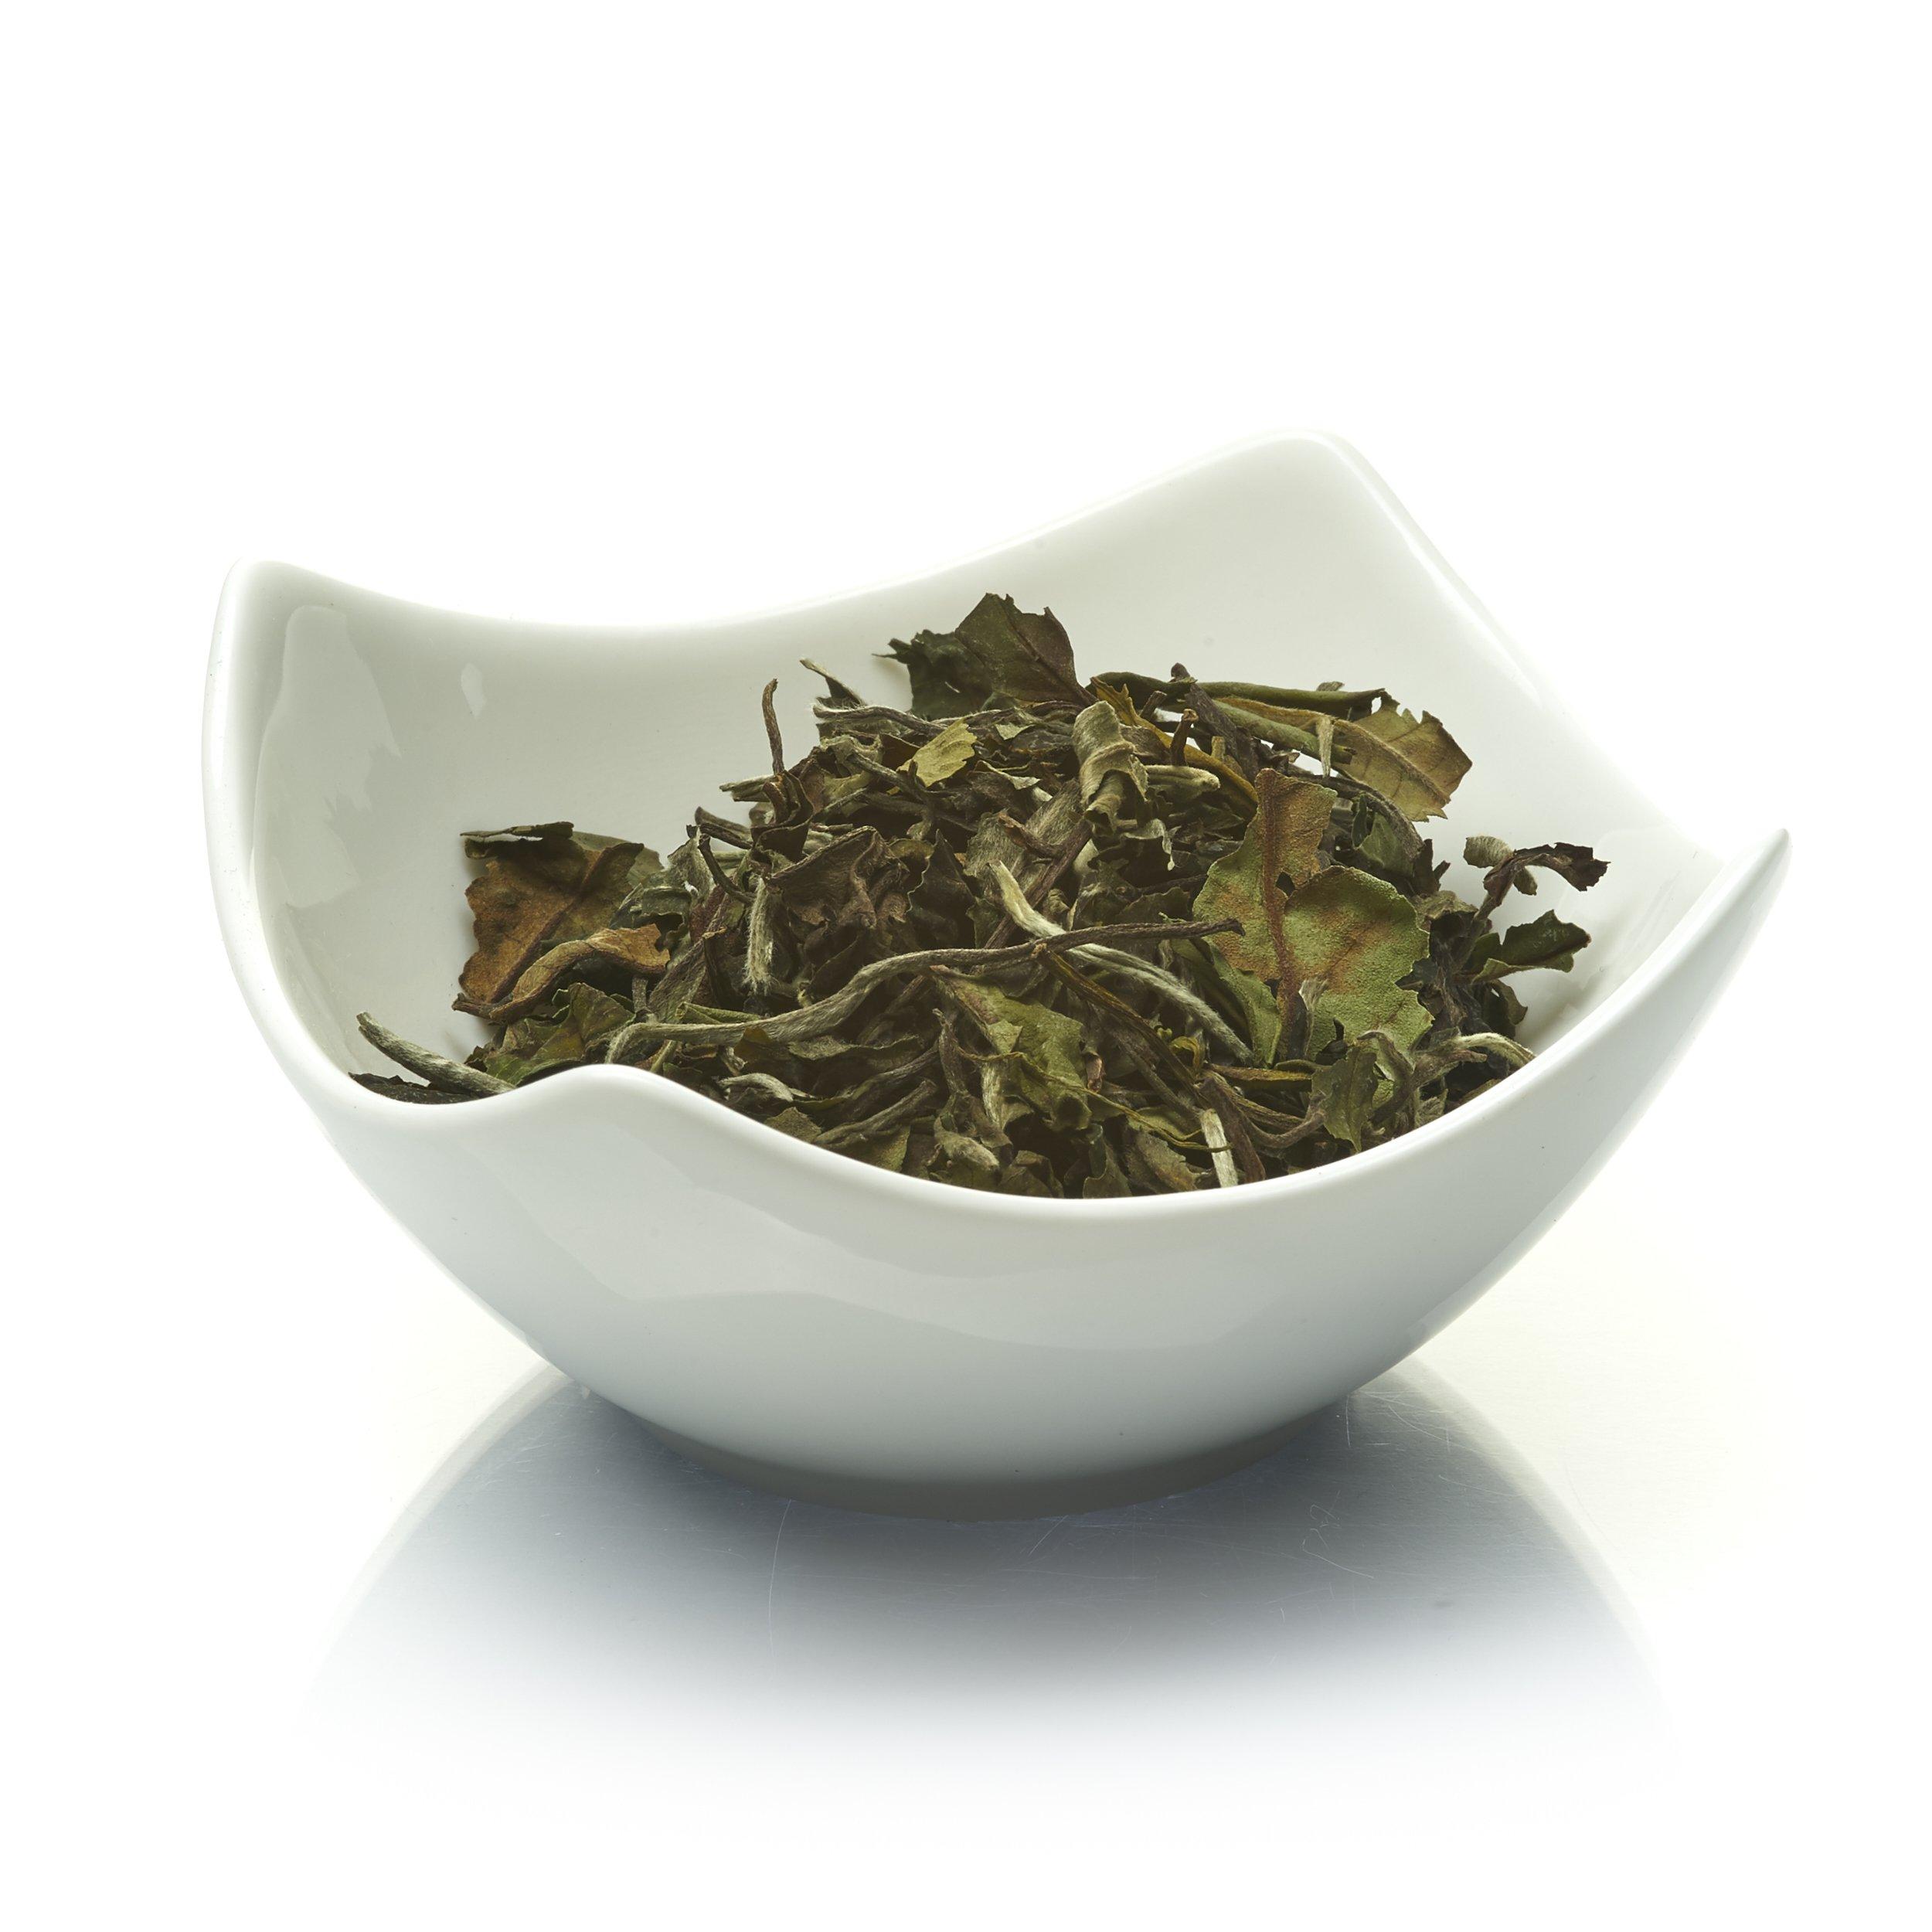 Weier-Tee-China-Pai-Mu-Tan-STD-6901-100g-Weie-Pfingstrose-unbehandelt-weich-blumig-terranea